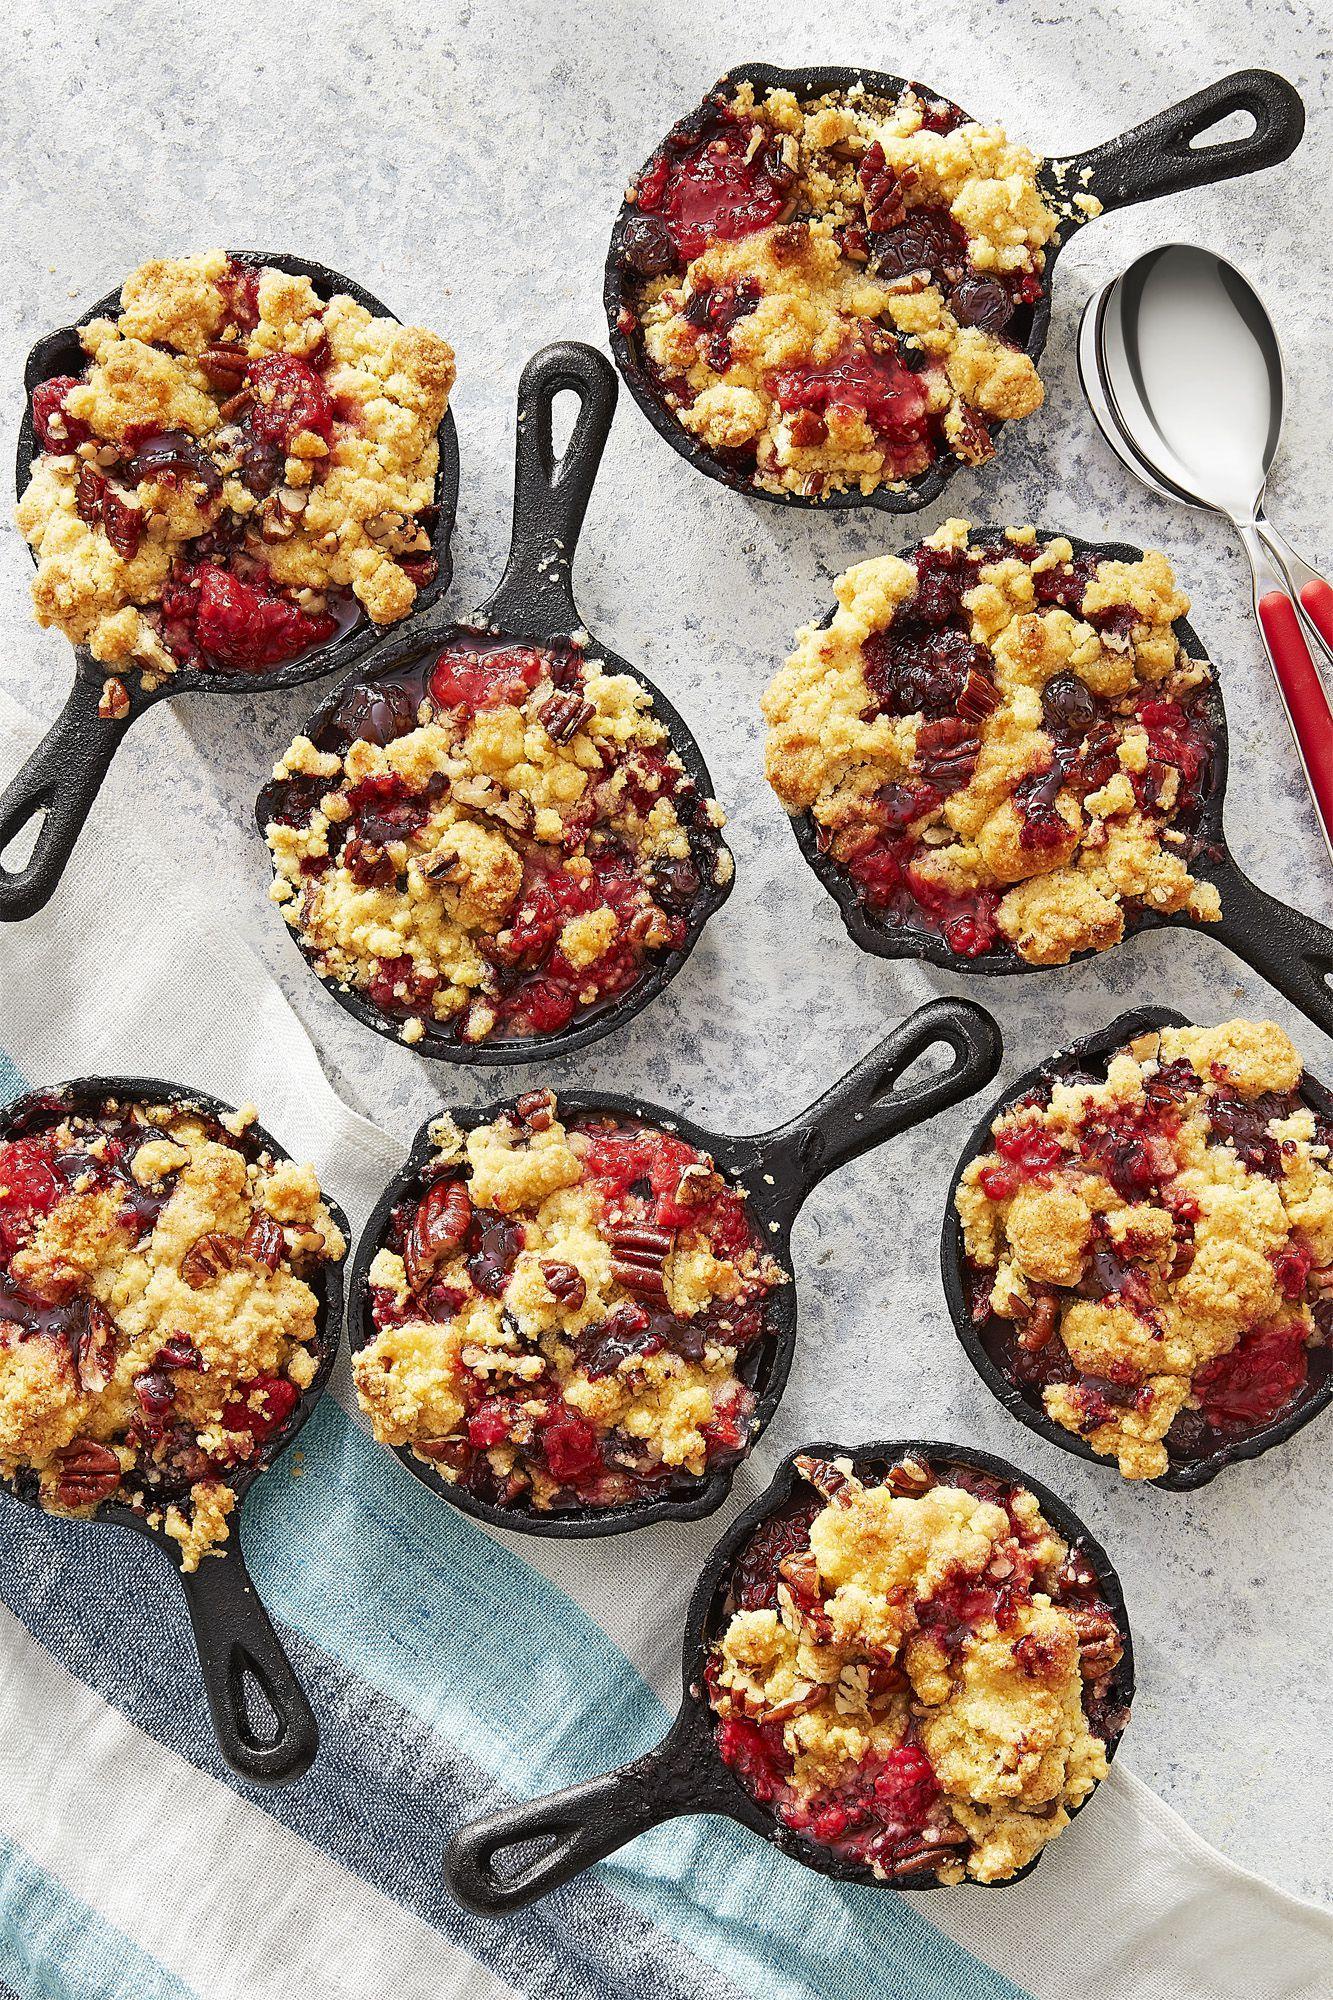 jiffy mixed berry cornmeal cobbler